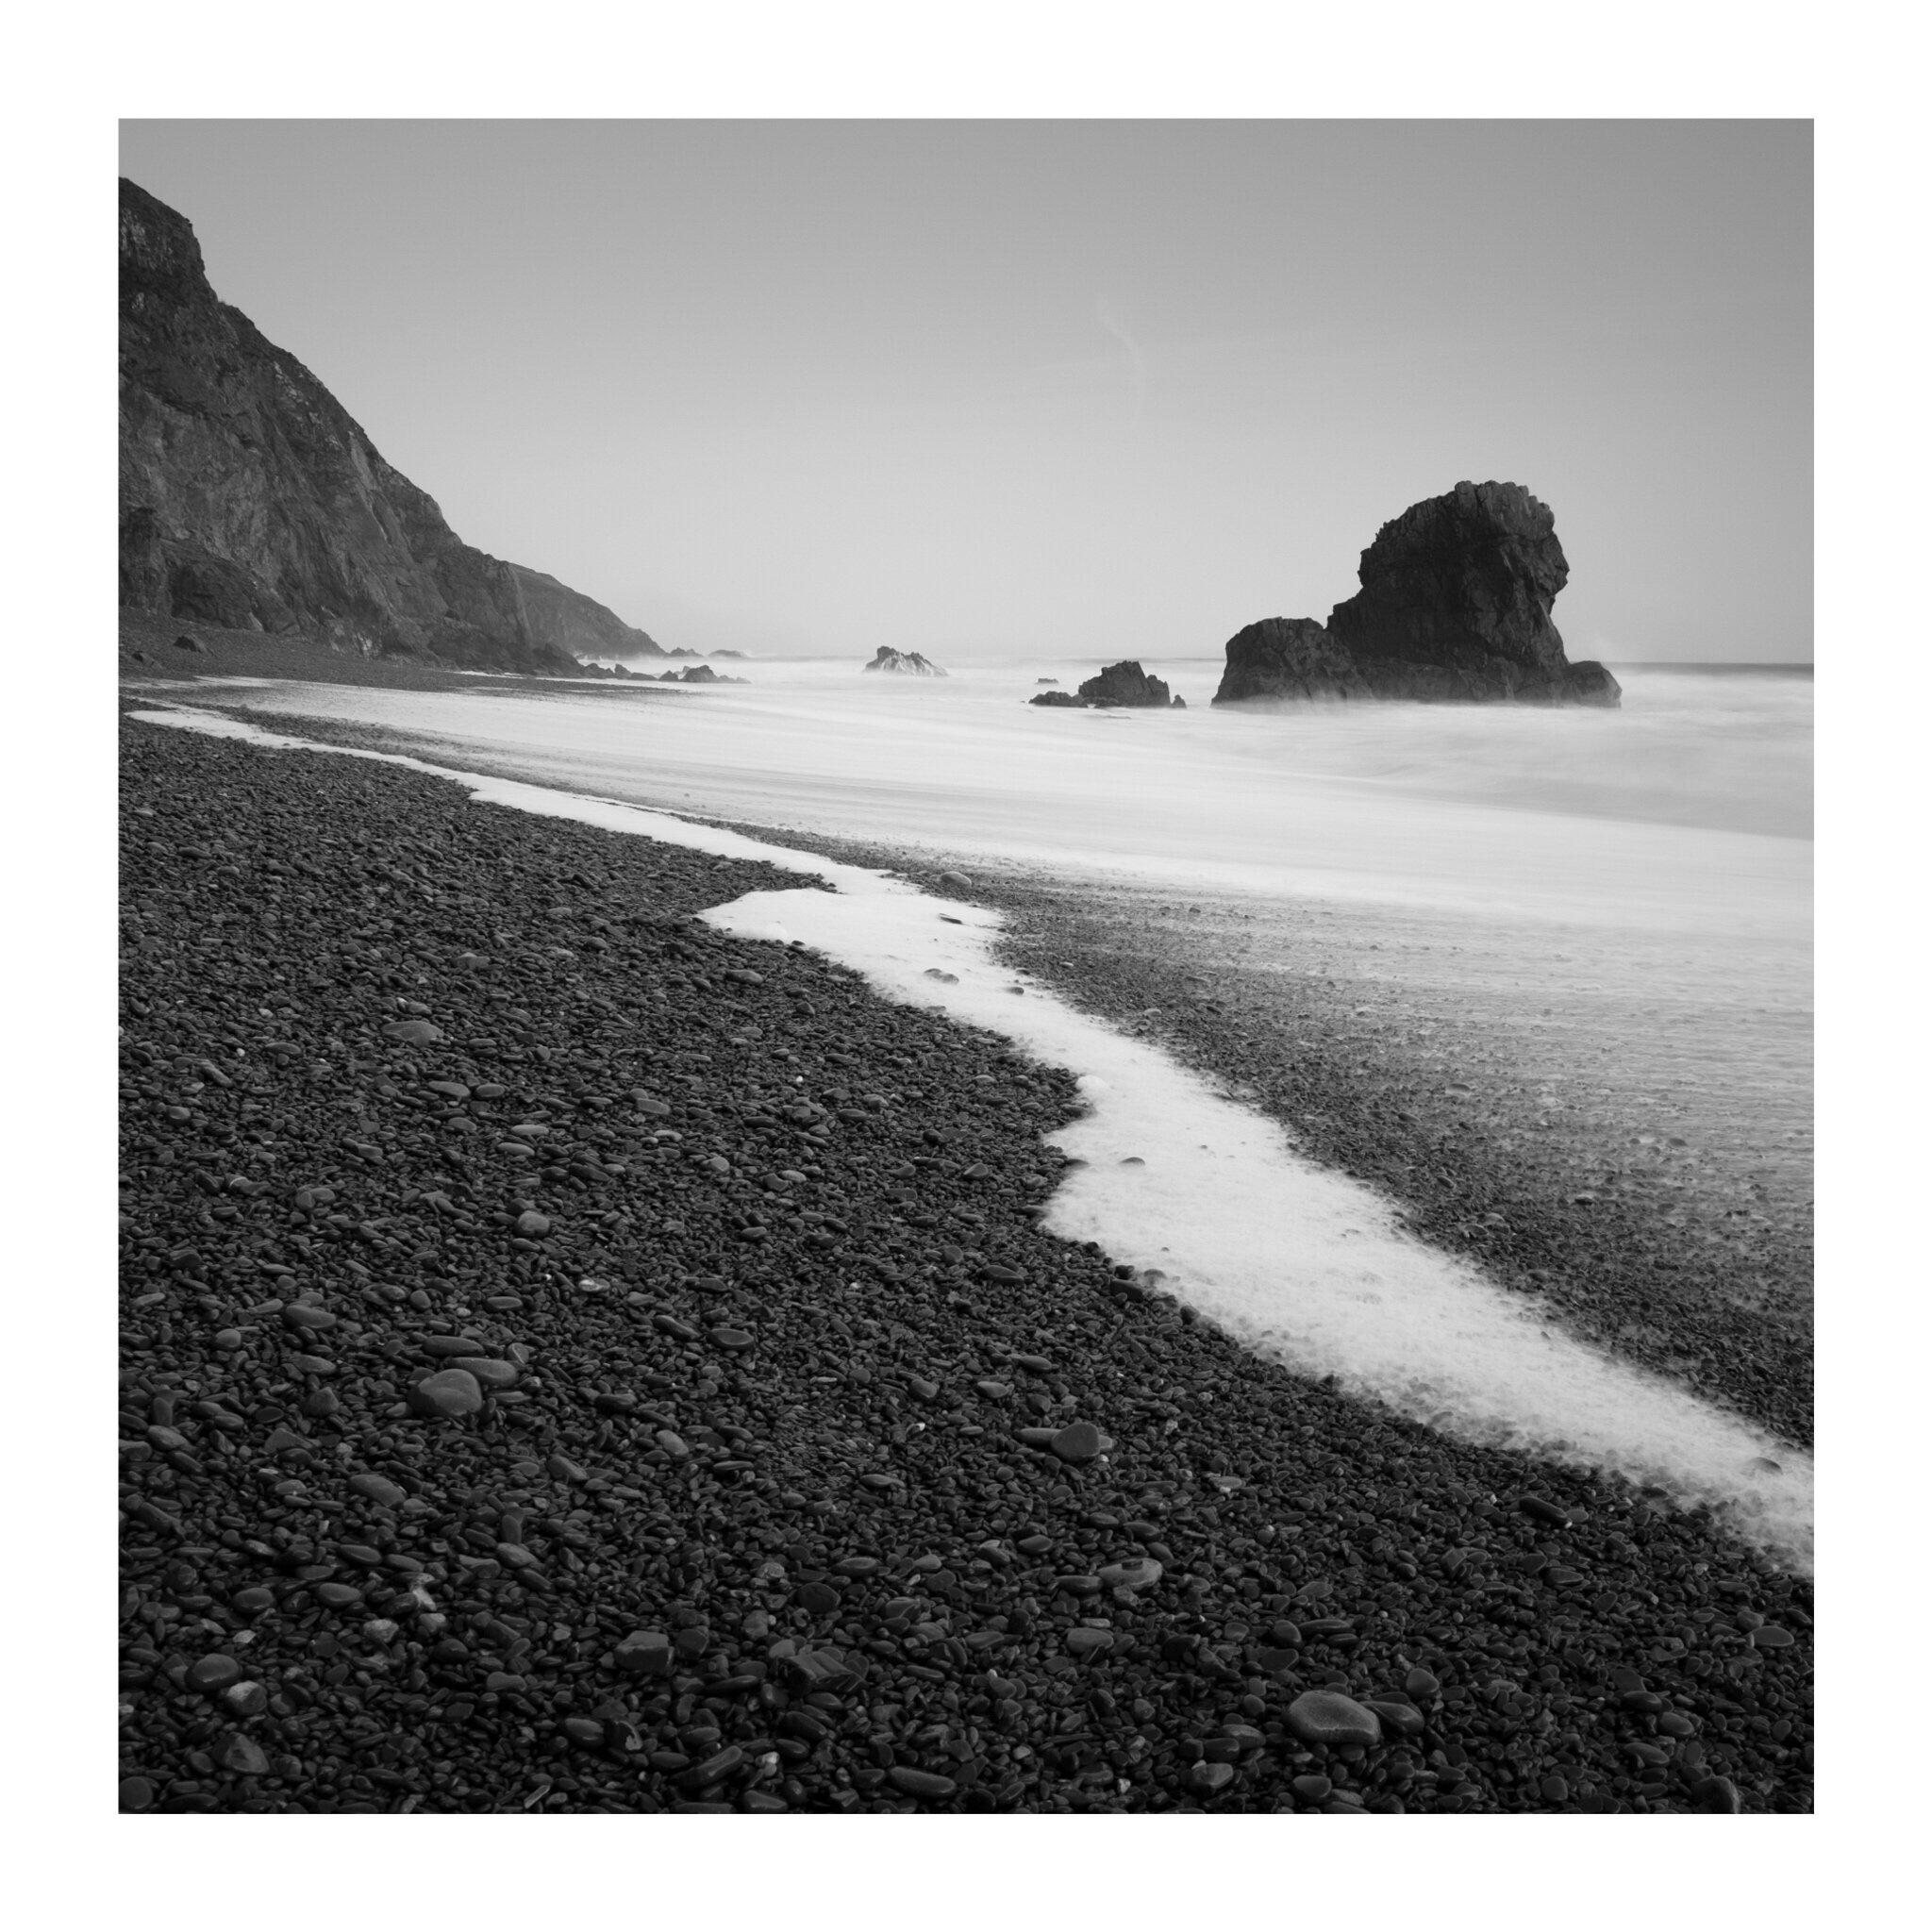 Knockmahon beach